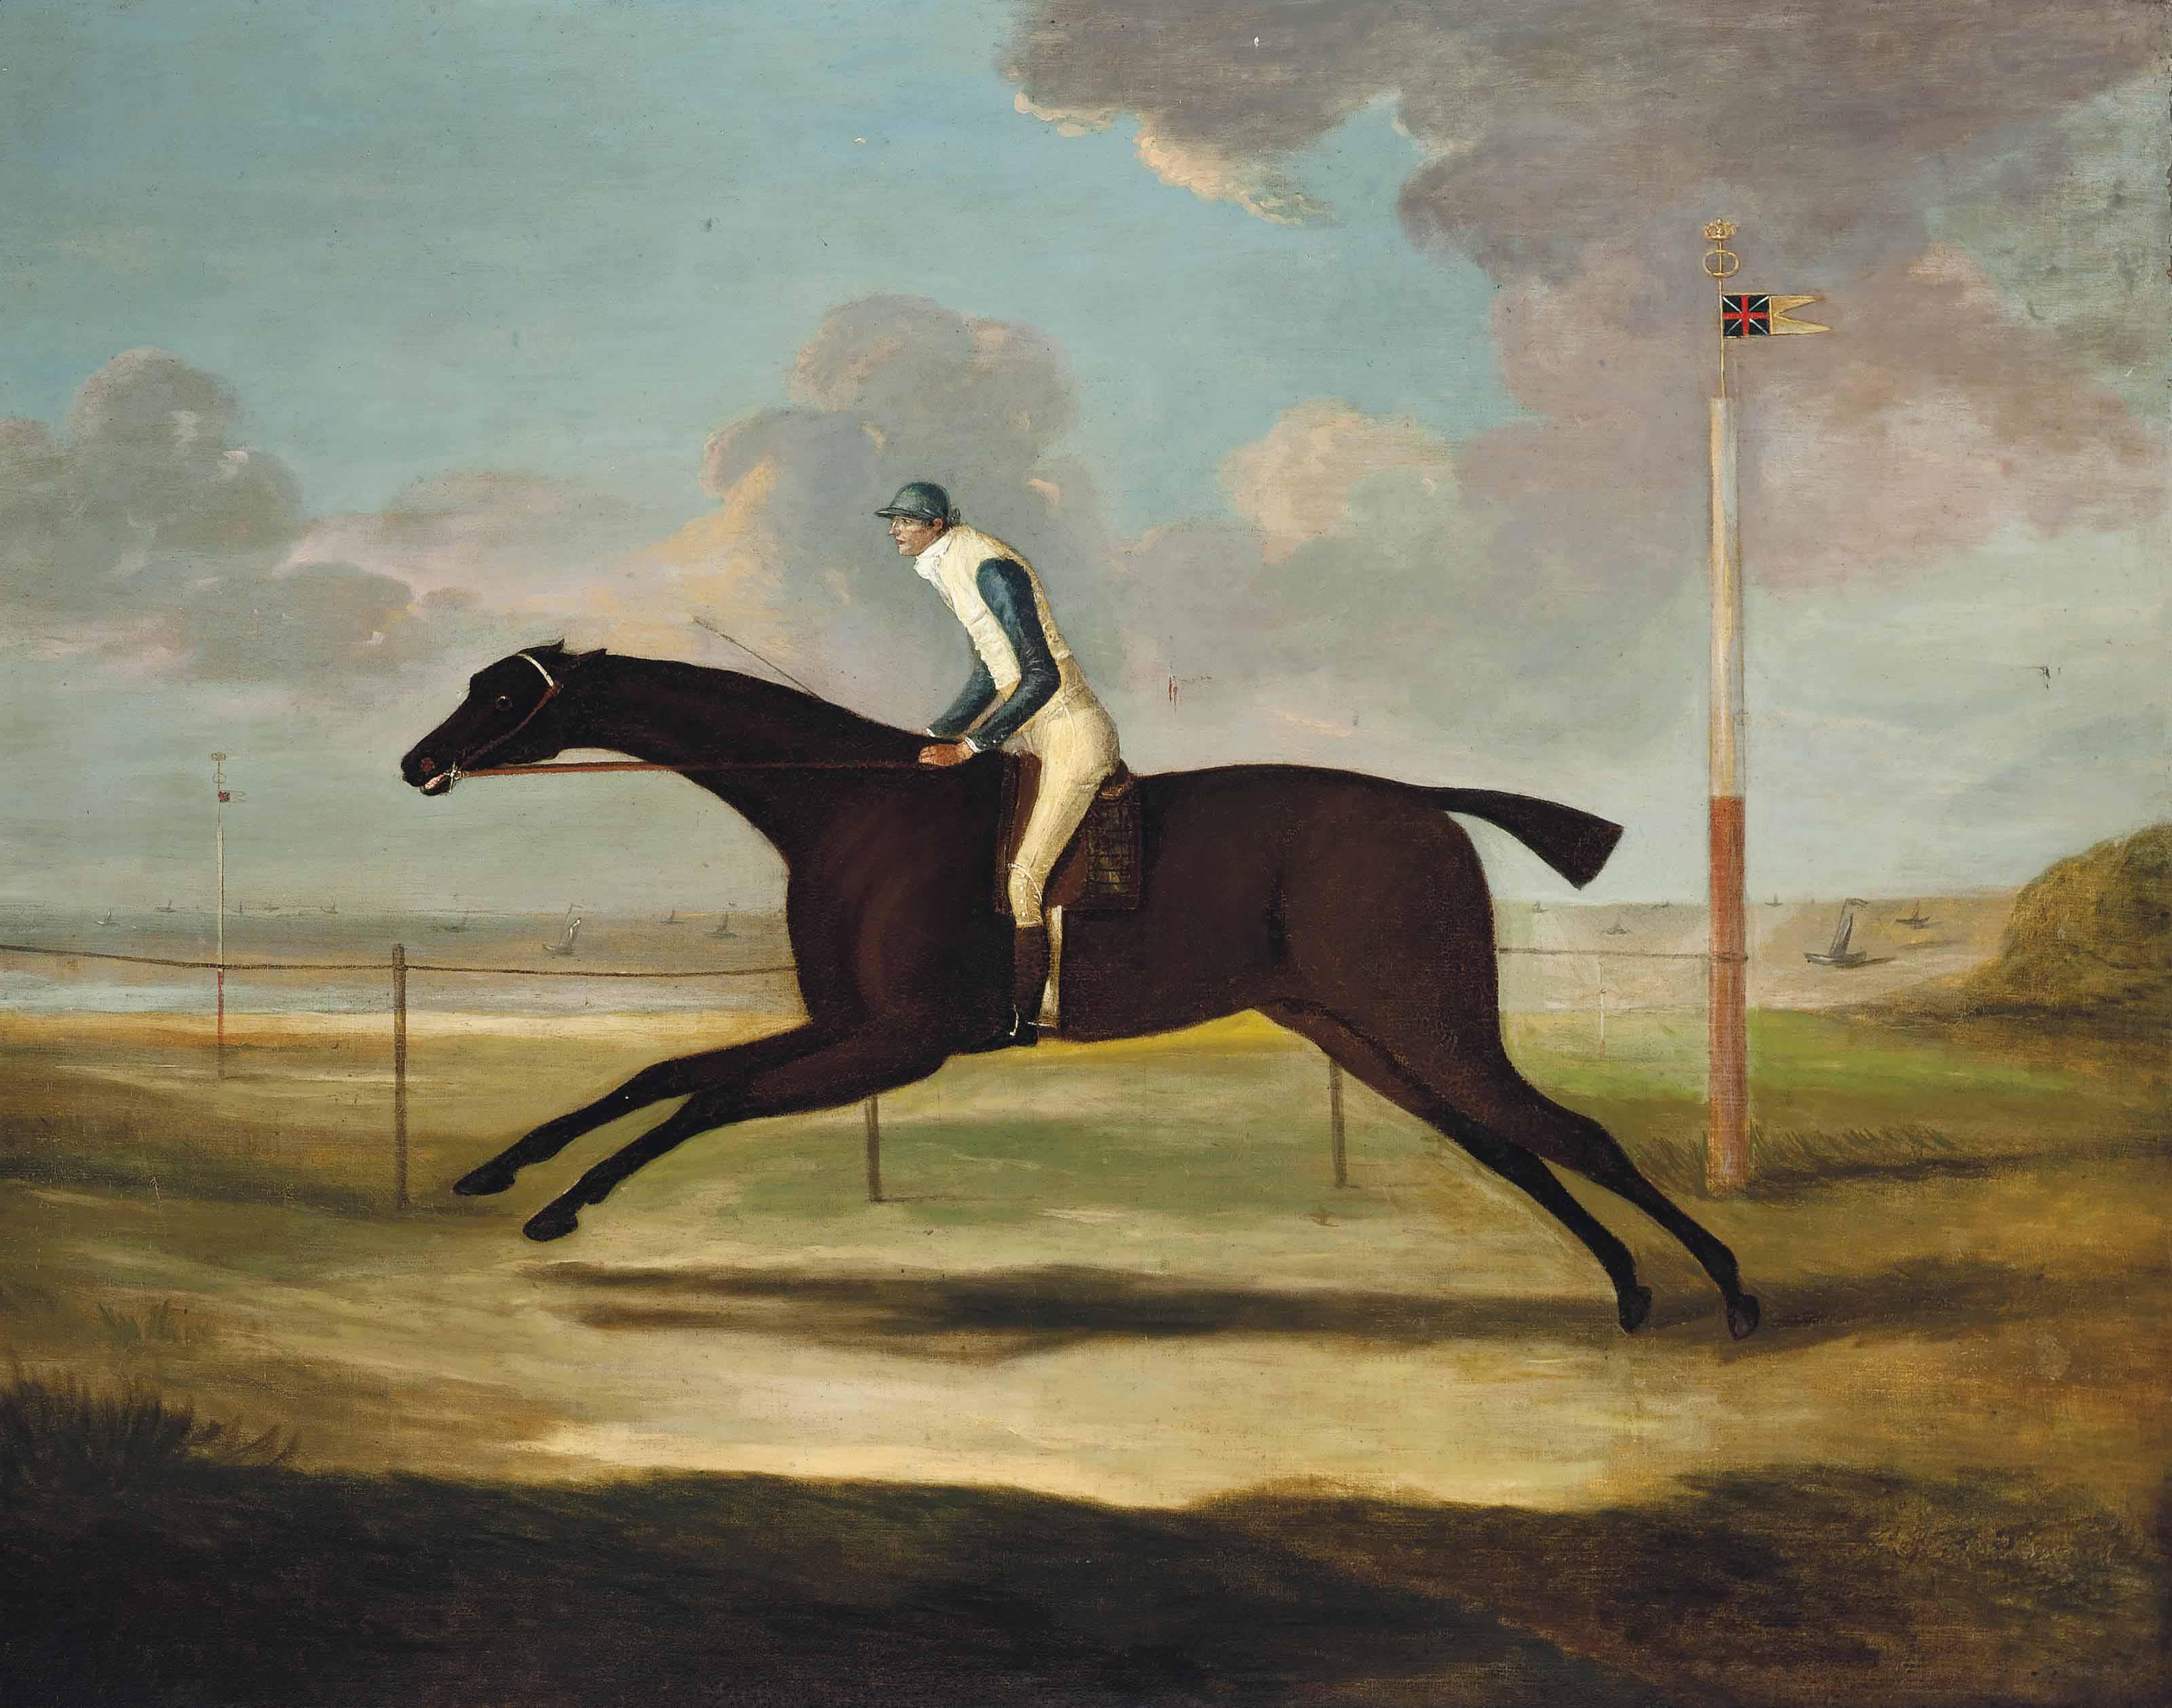 Scorpion, with jockey up, on Musselburgh racecourse